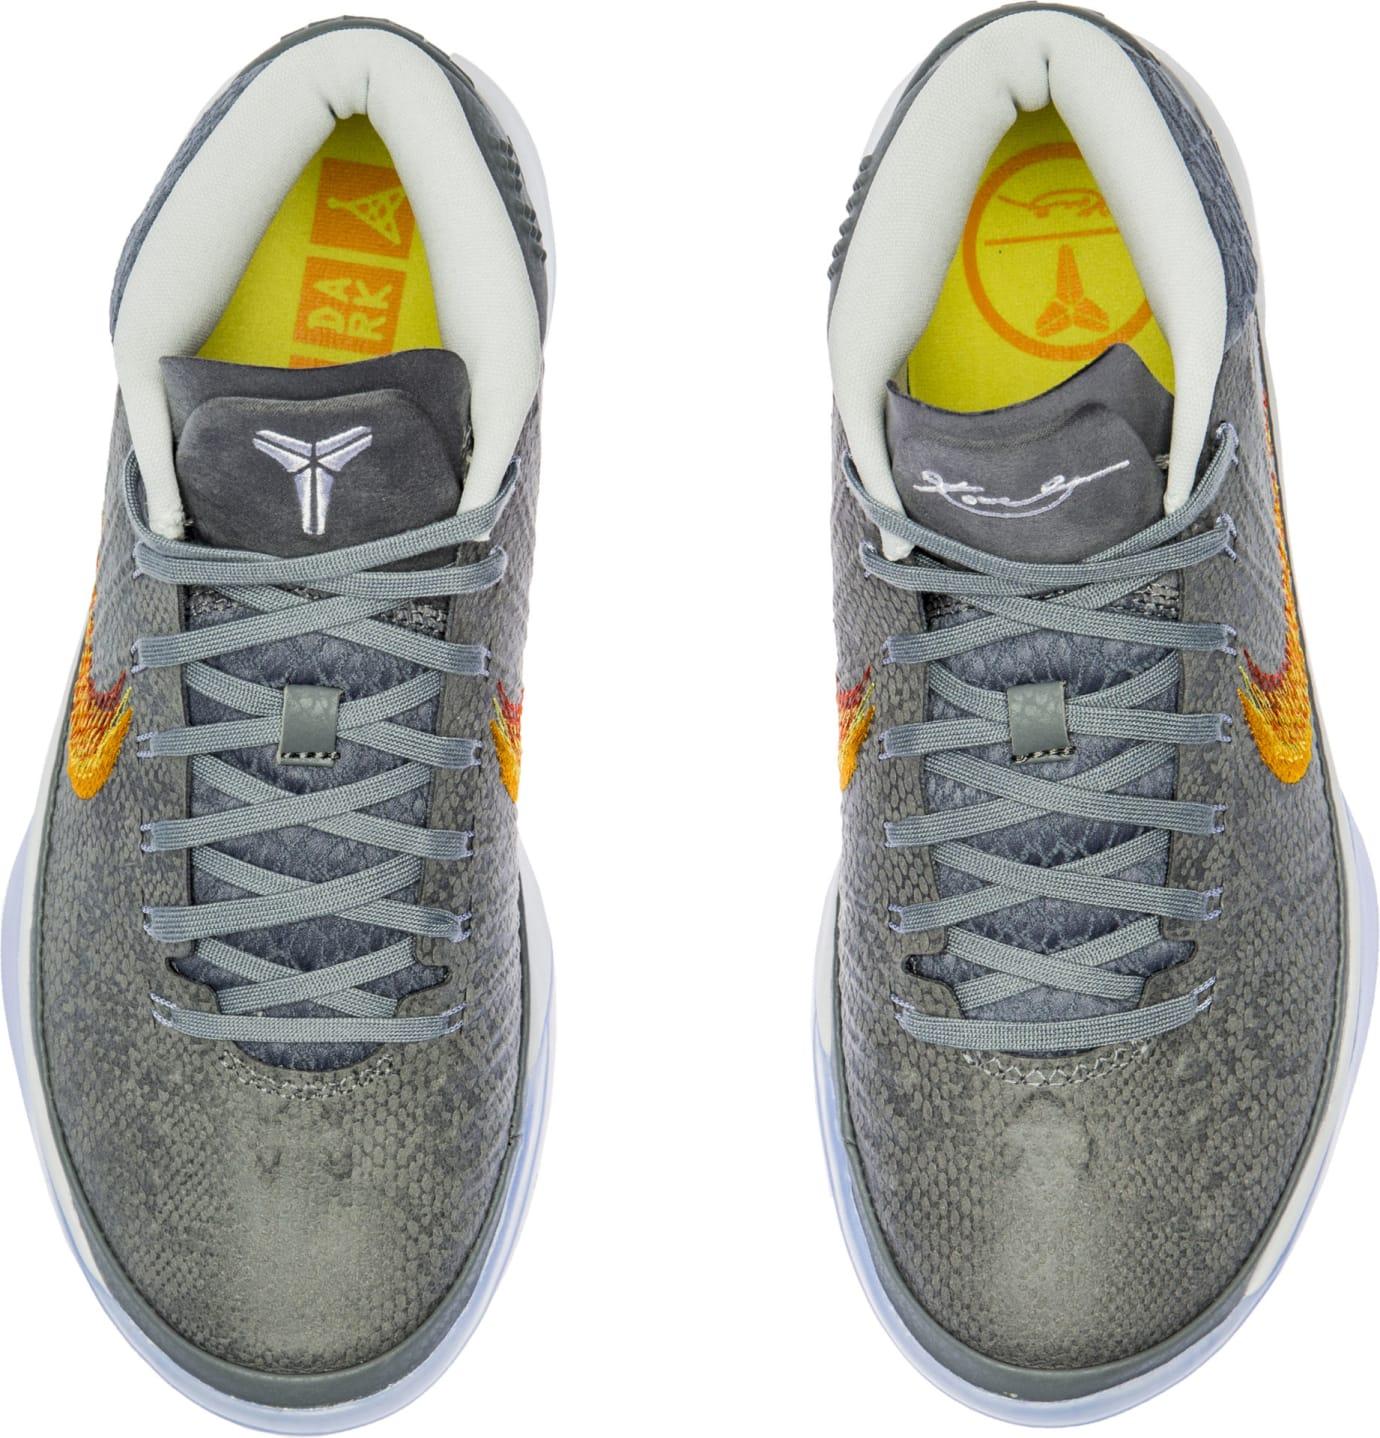 reputable site 65cf1 c9f78 Nike Kobe A.D. Mid Chrome Release Date 922482-005 Top